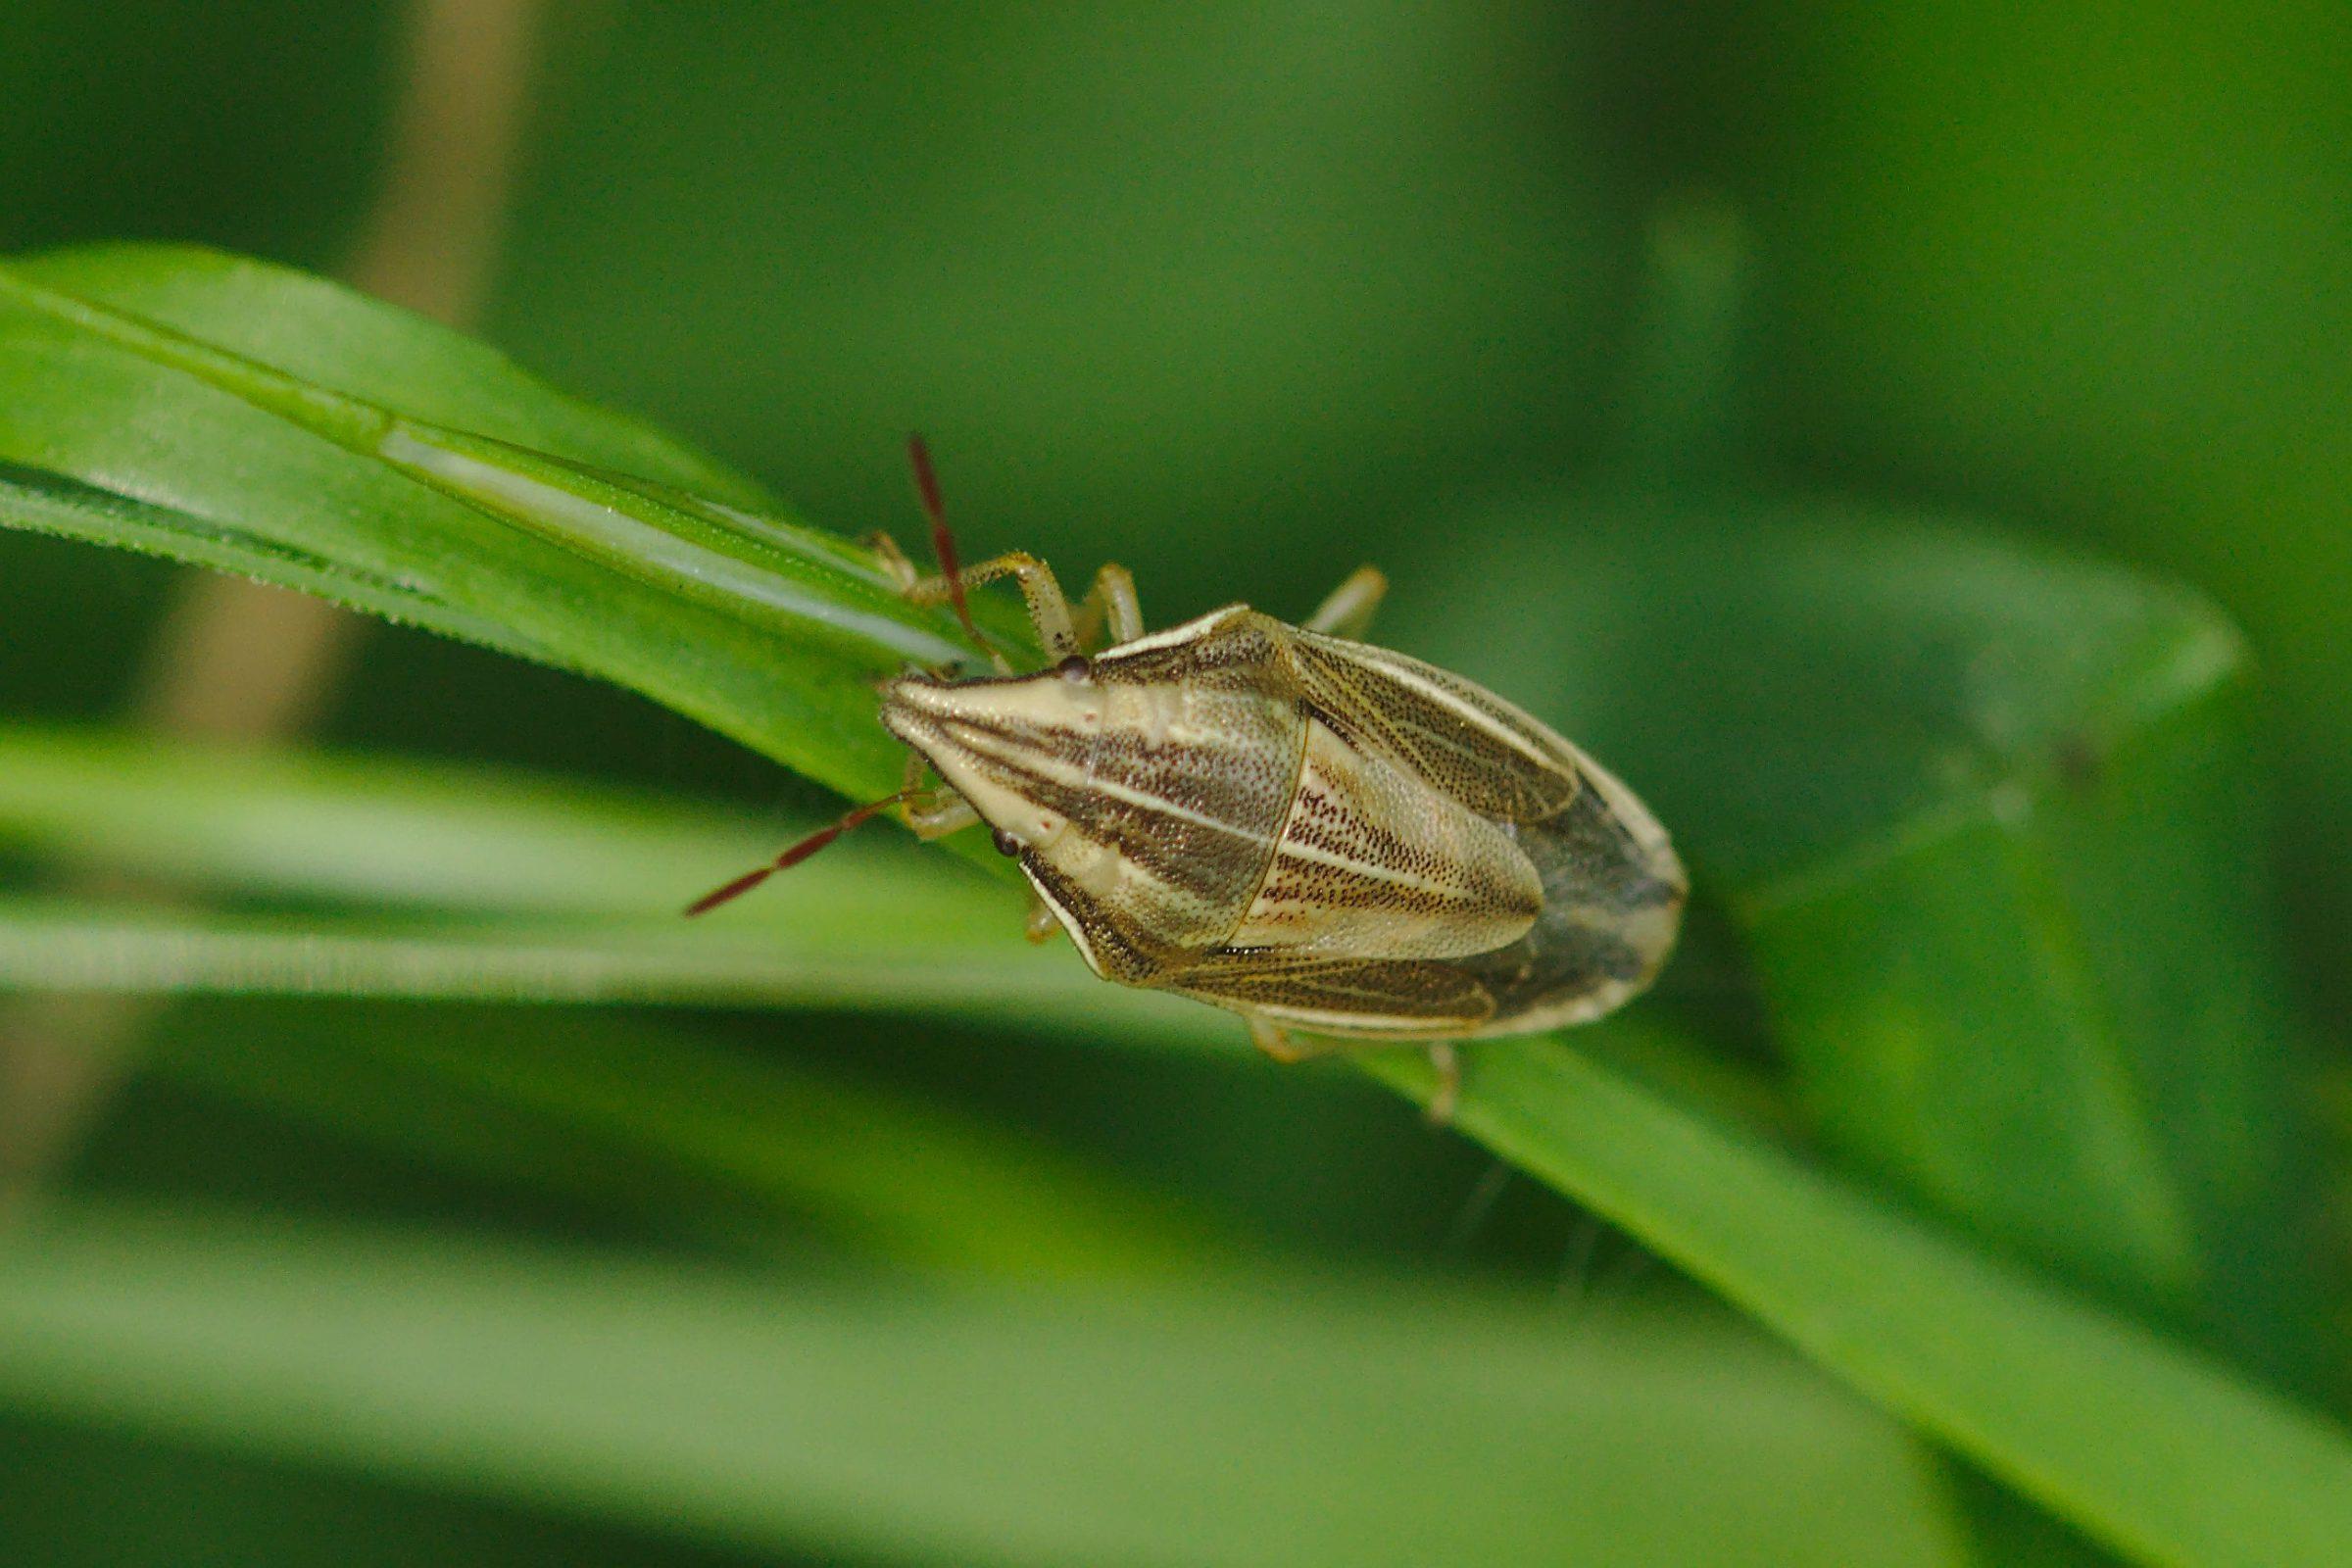 <i>Aelia acuminata</i> (Spitzling)